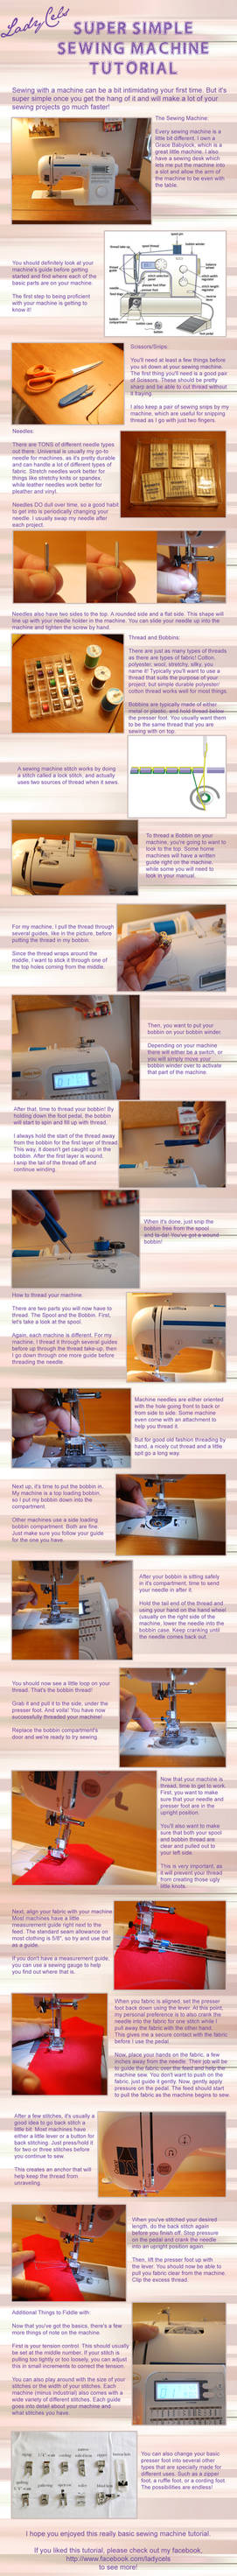 Super Simple Sewing Machine Tutorial